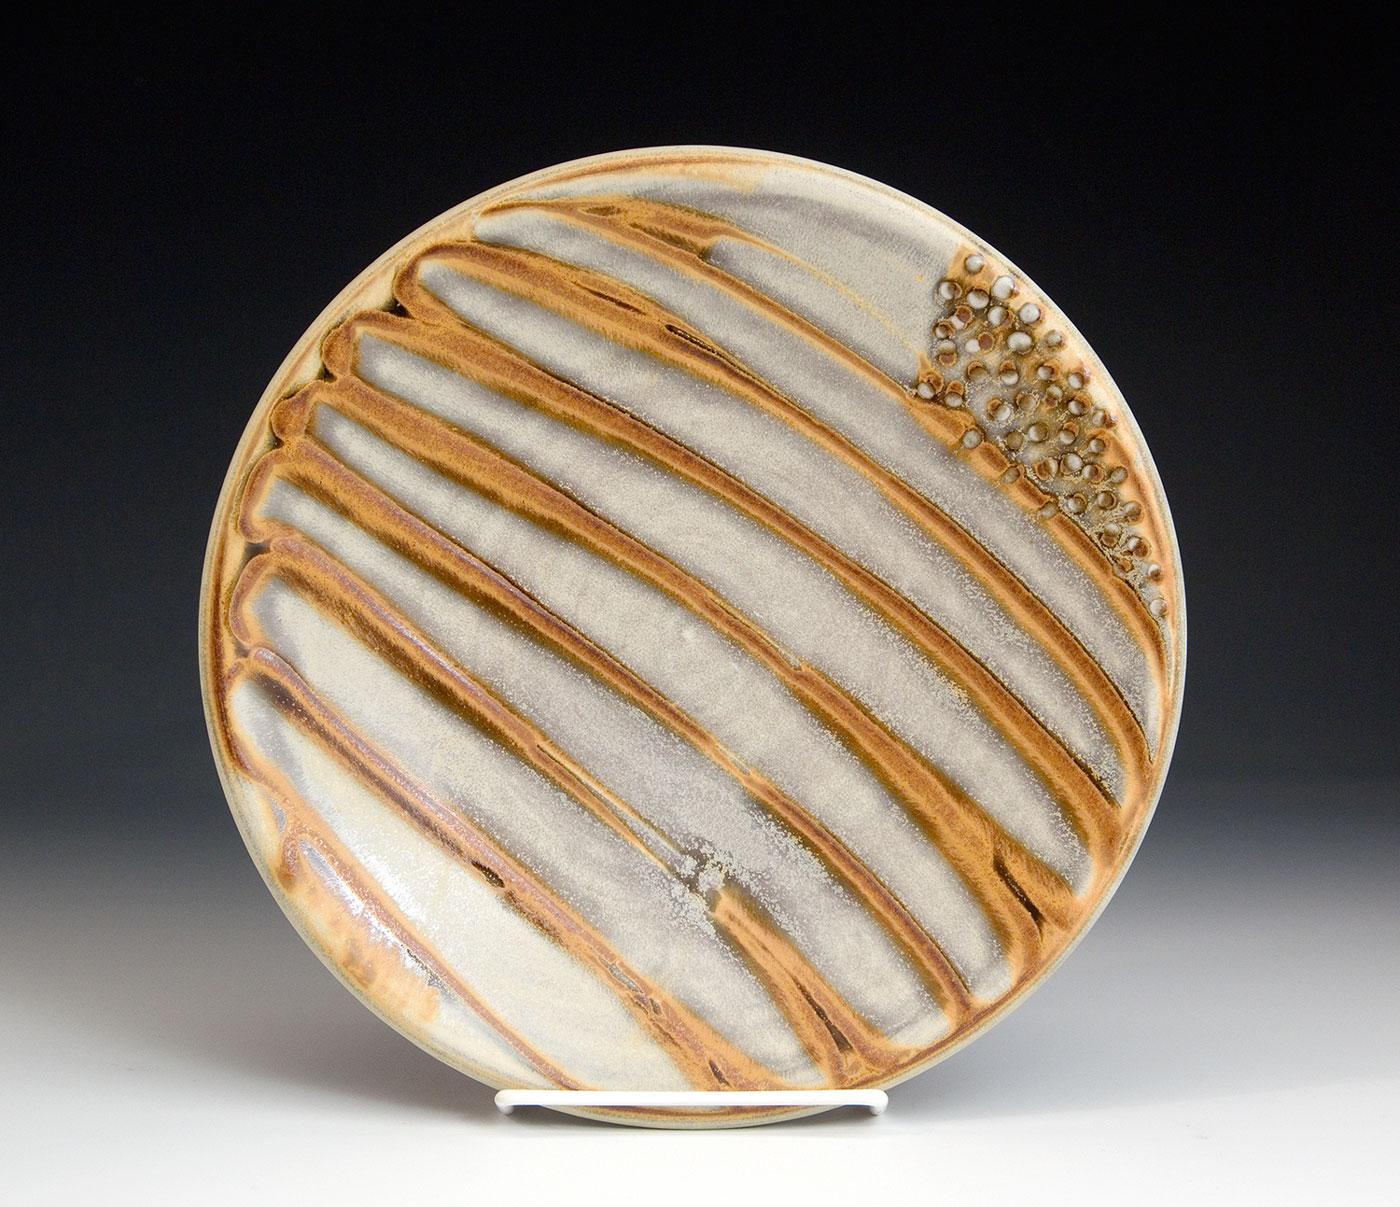 Functional-Art-Ceramic-Plate-Samantha-Henneke.jpg